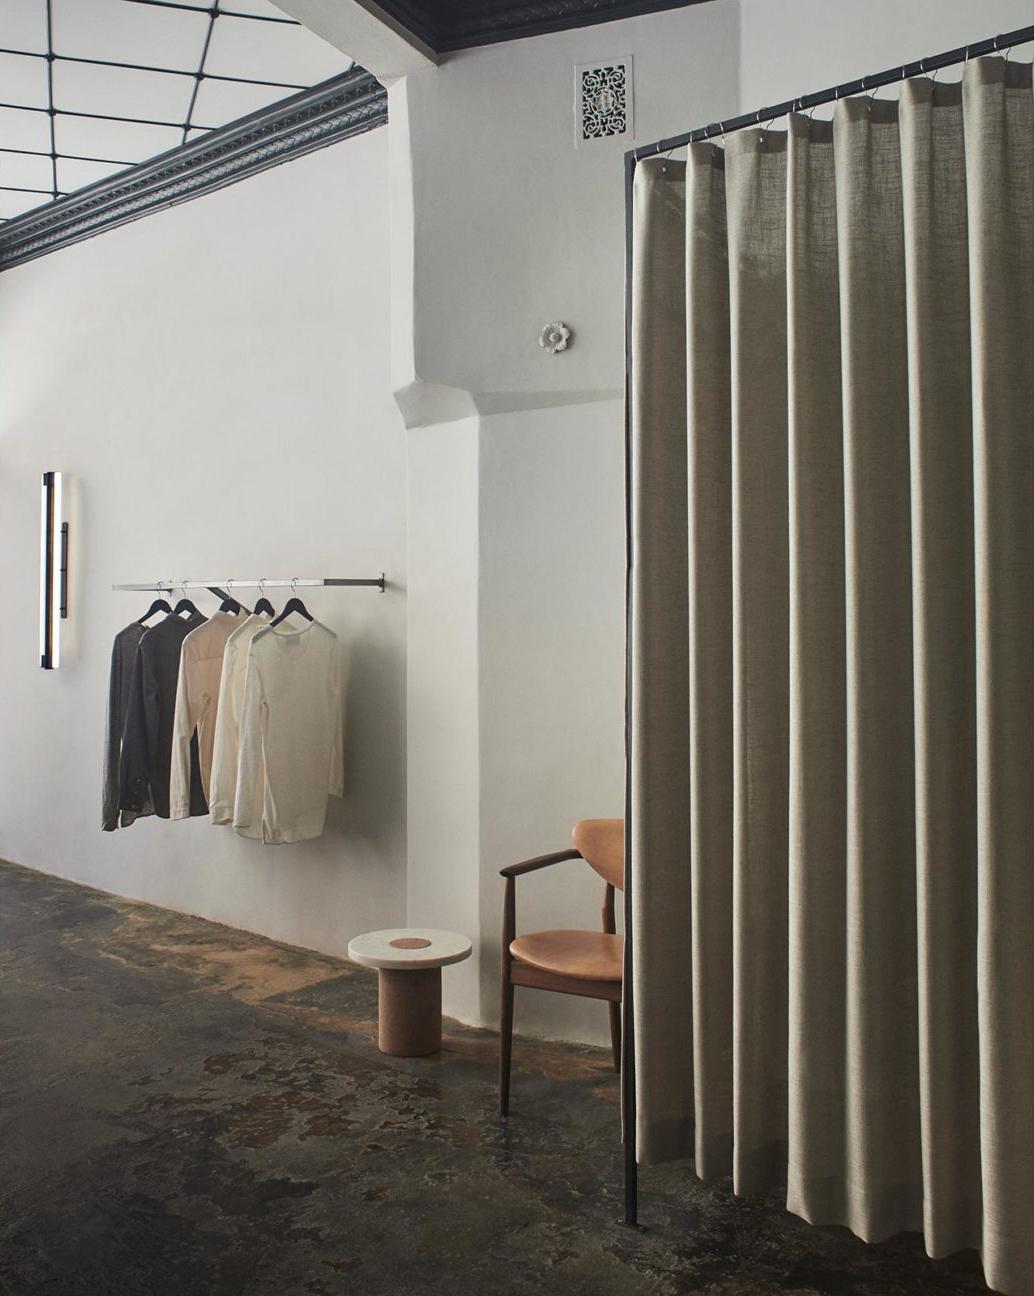 Menswear store W19 by Frama